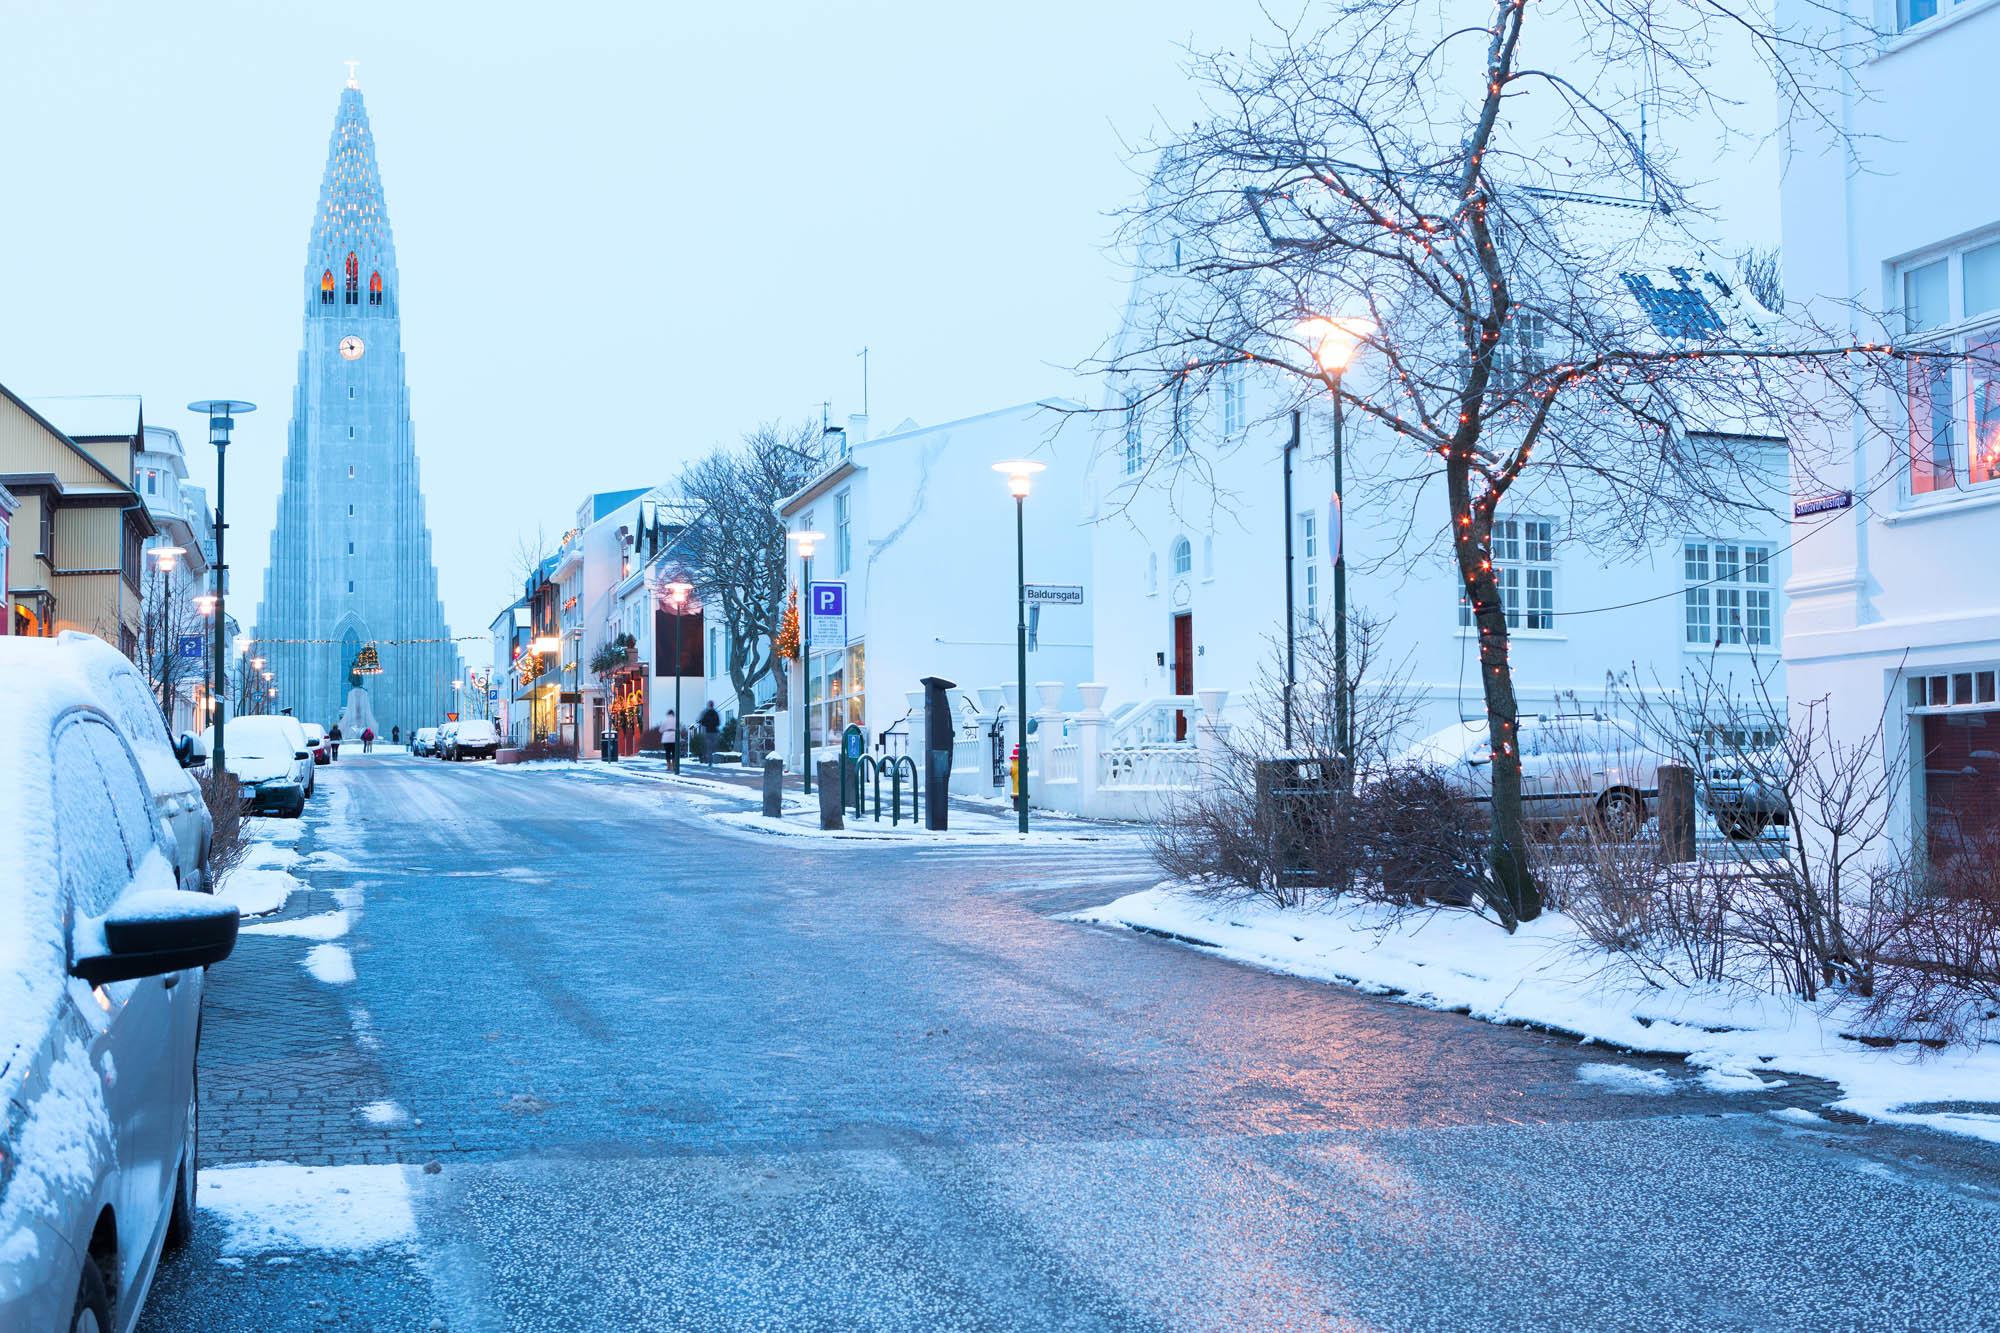 Hallgrimskirkja in Winter street view